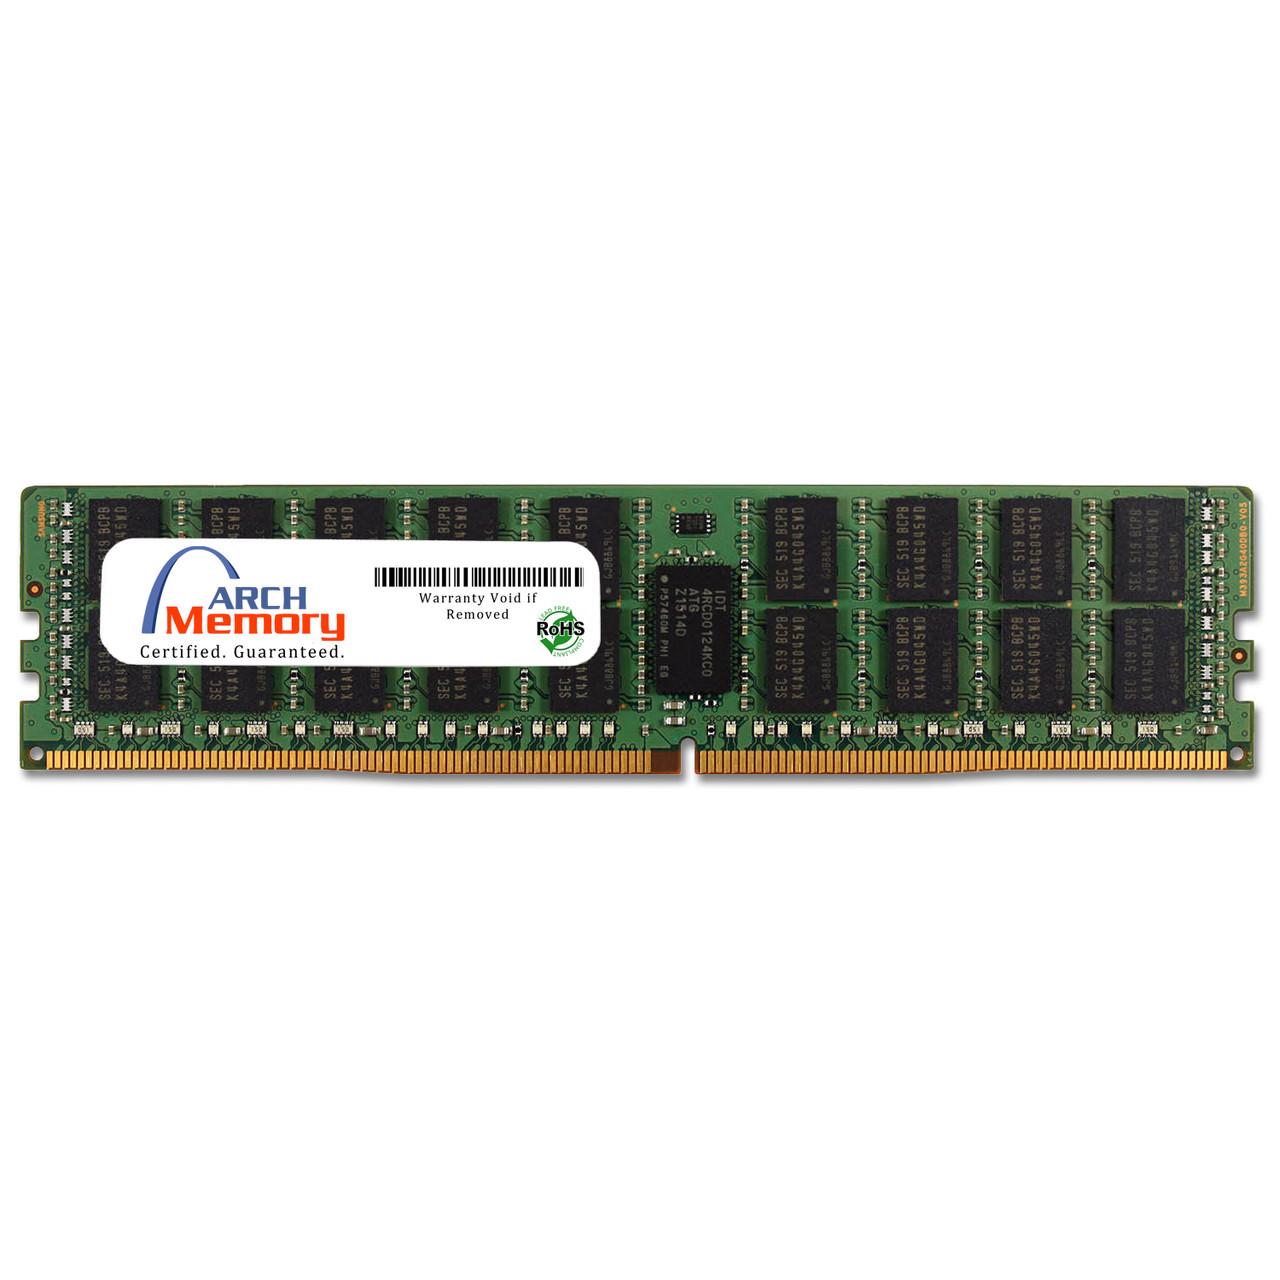 Cisco UCS-MR-X32G2RT-H 32 GB 288-Pin DDR4 2933 MHz RDIMM RAM